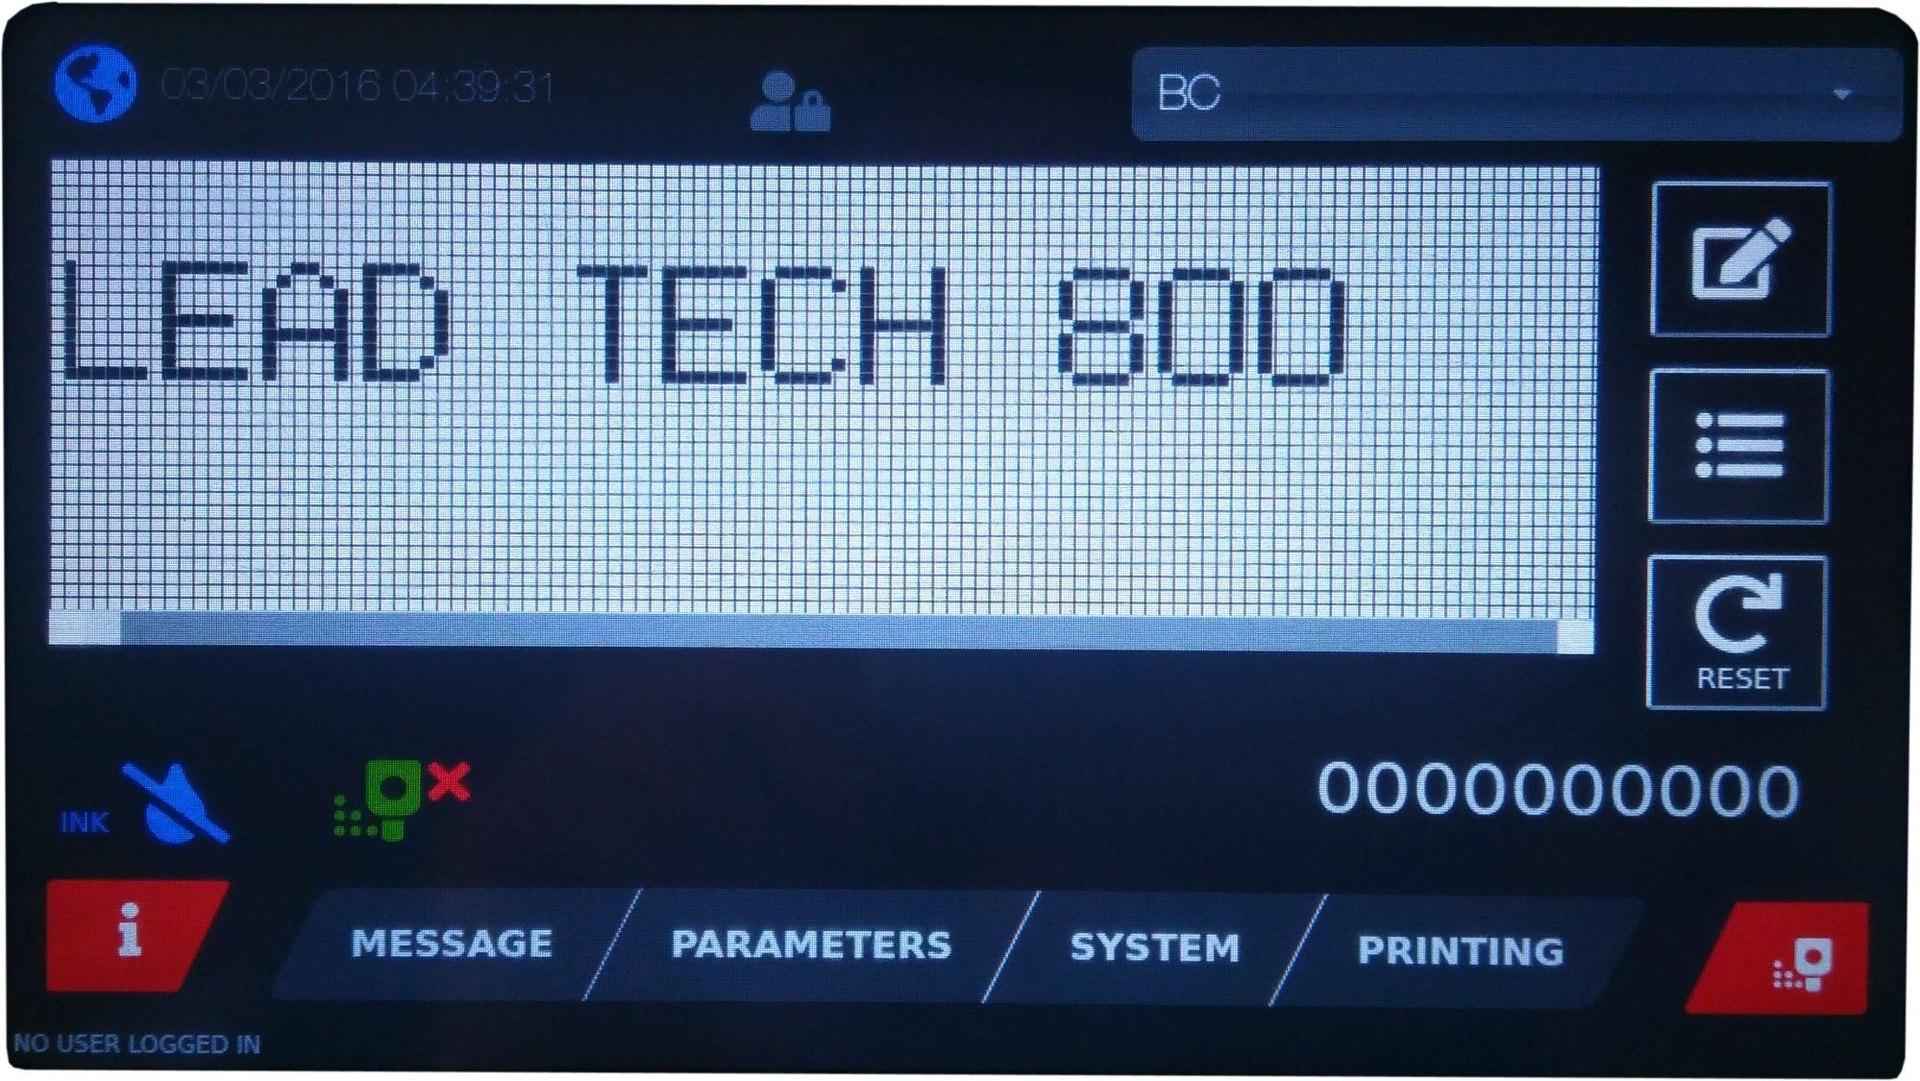 Lt800 Low Cost Cij Inkjet Printer